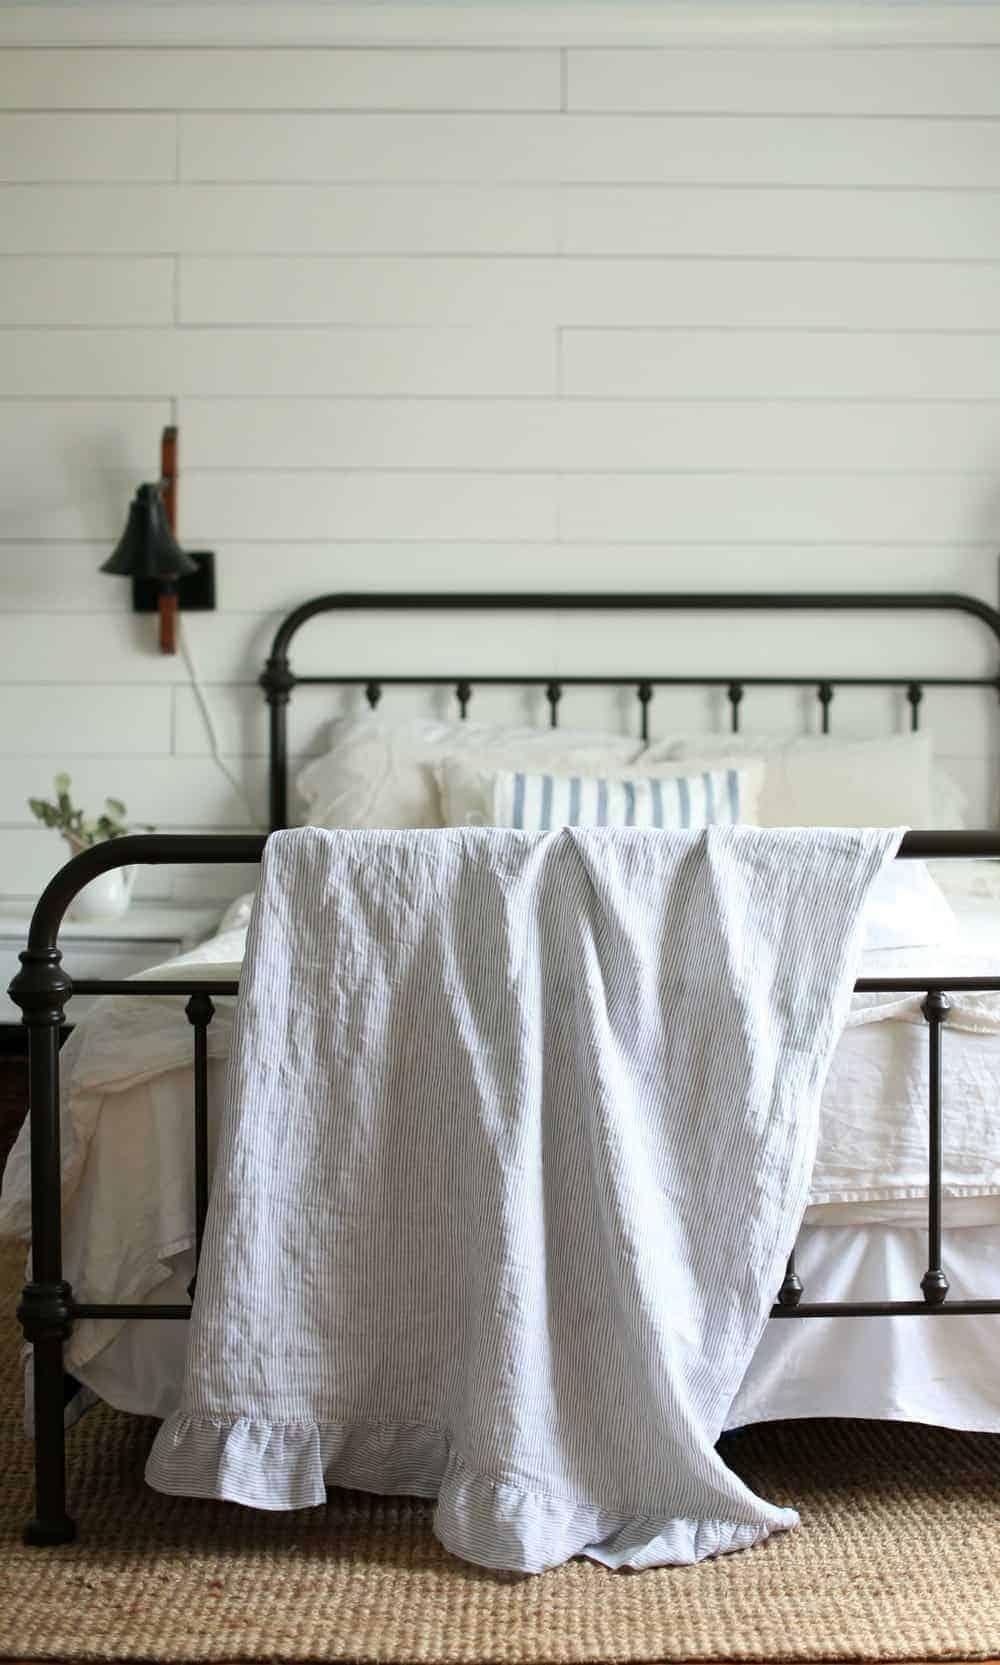 Linen and Ruffle Throw Blanket Tutorial